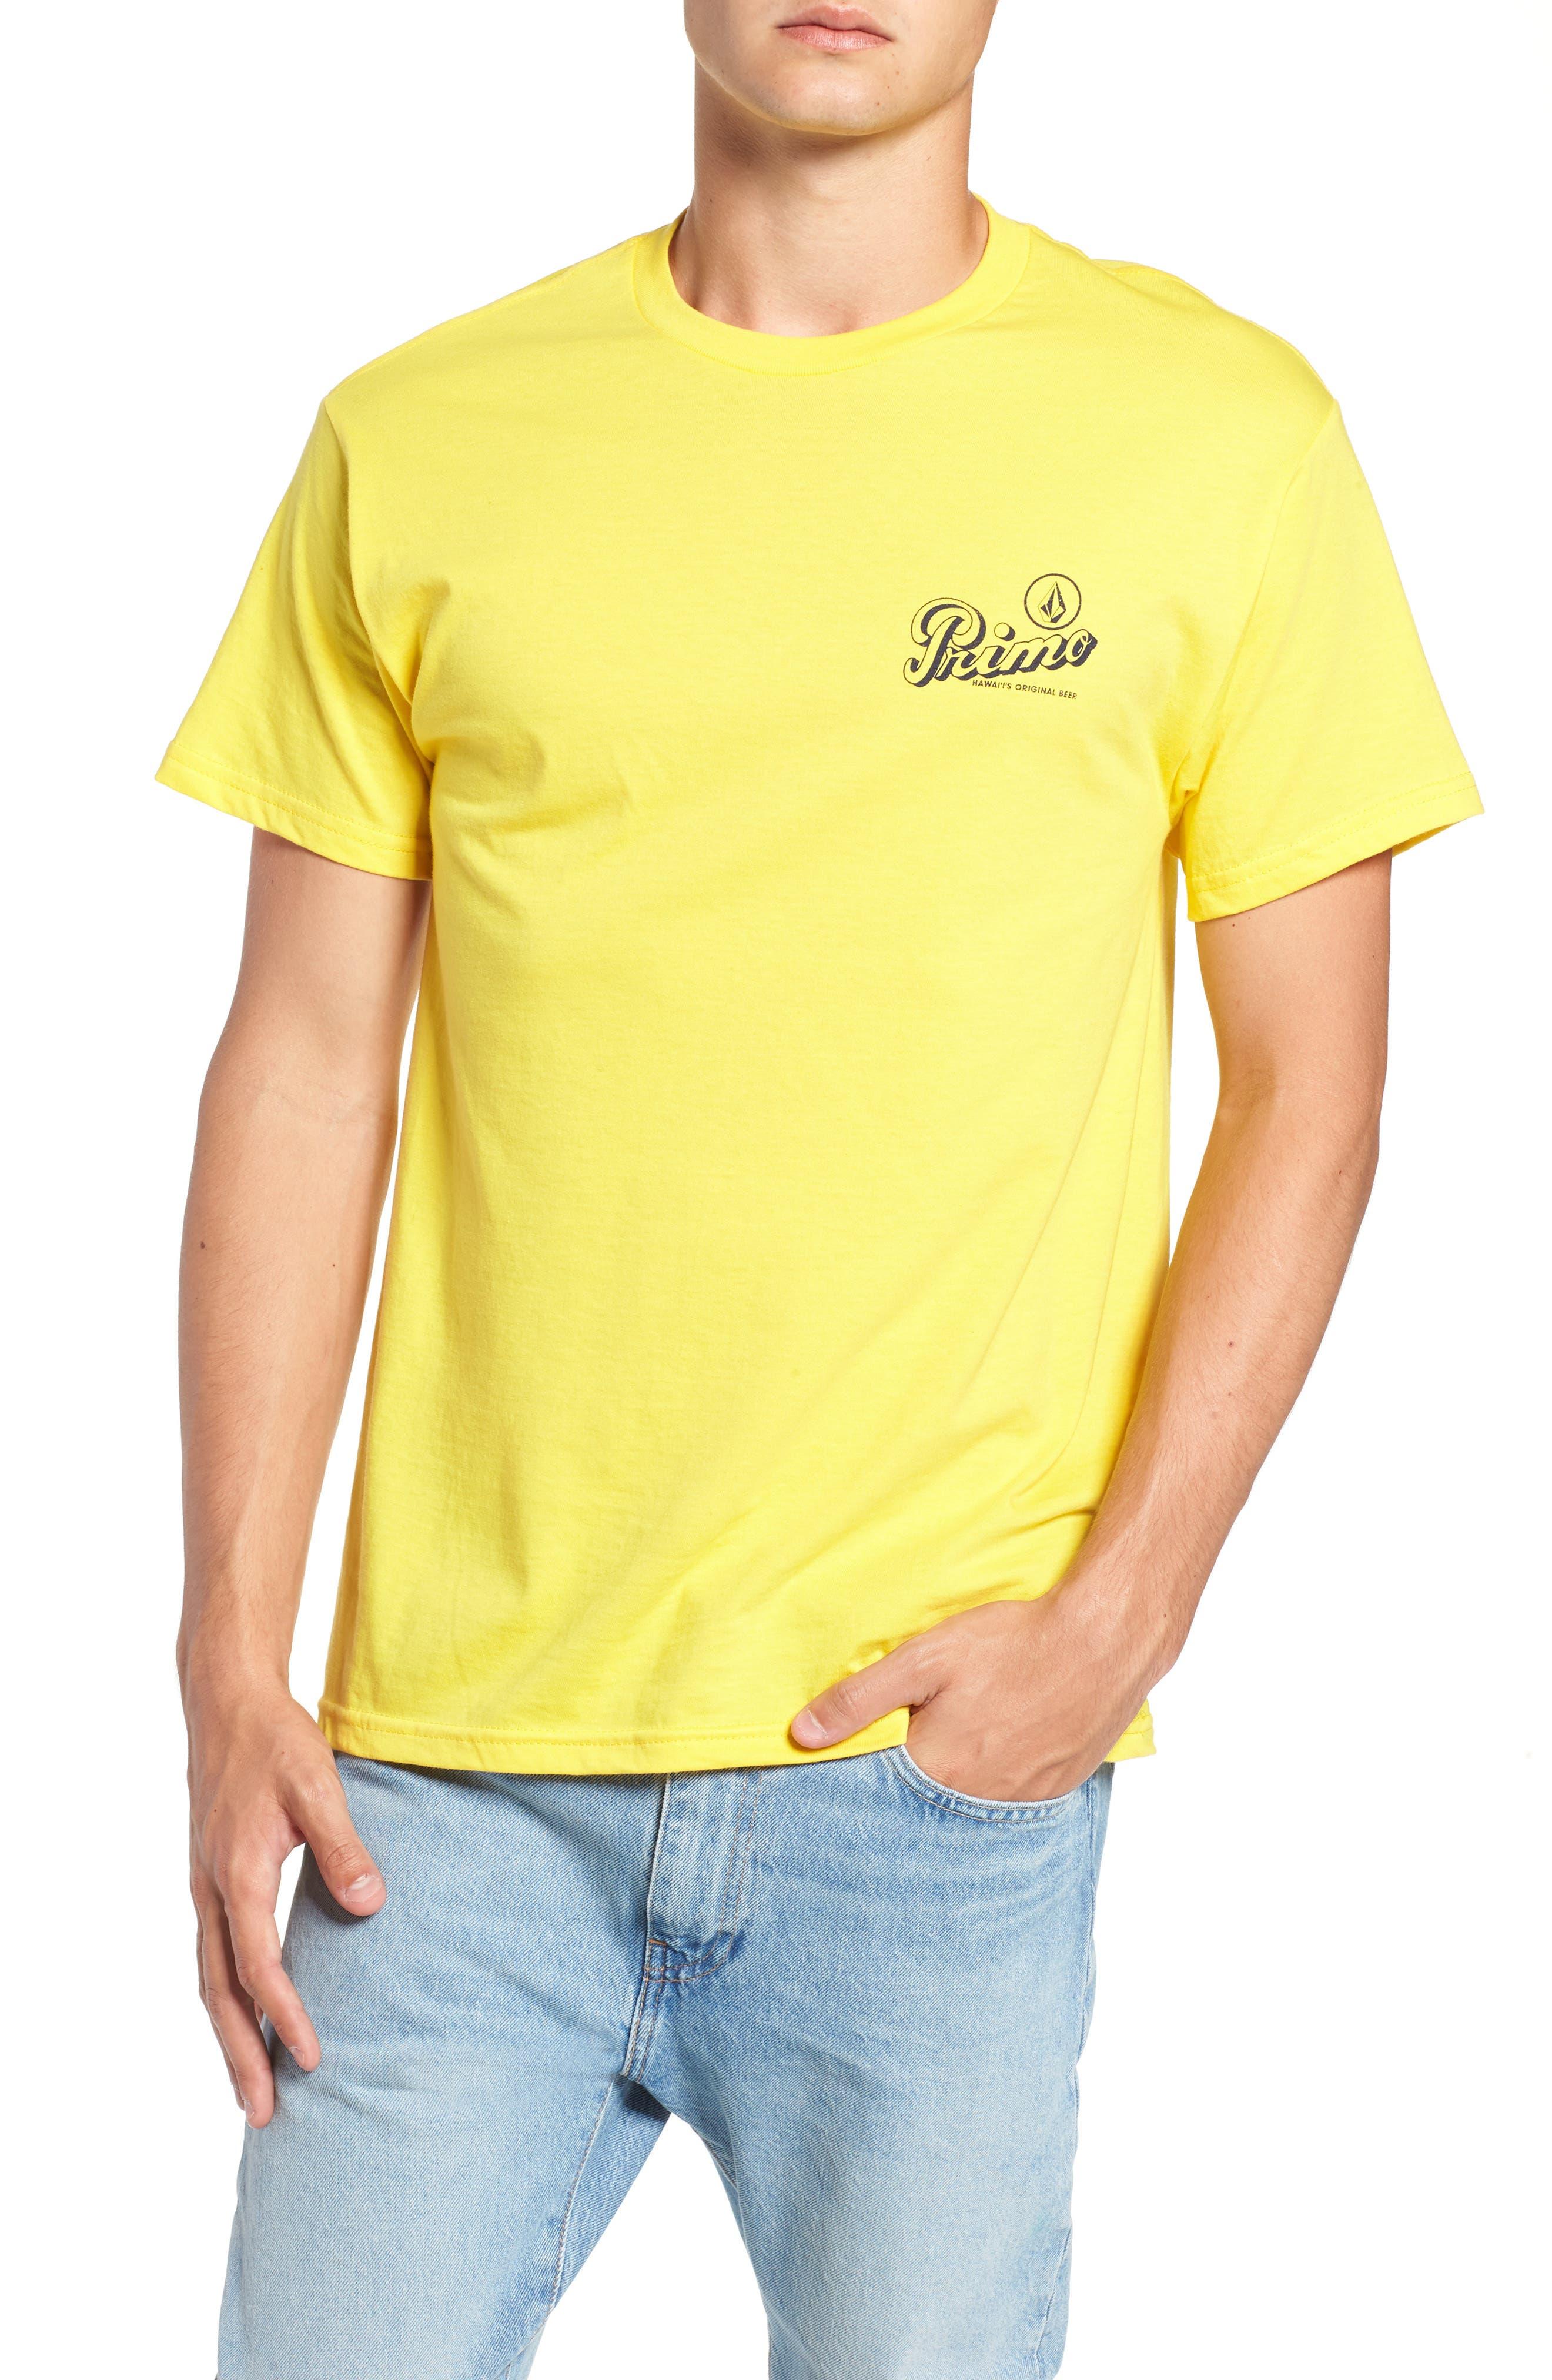 Primo Island T-Shirt,                             Main thumbnail 1, color,                             CYBER YELLOW